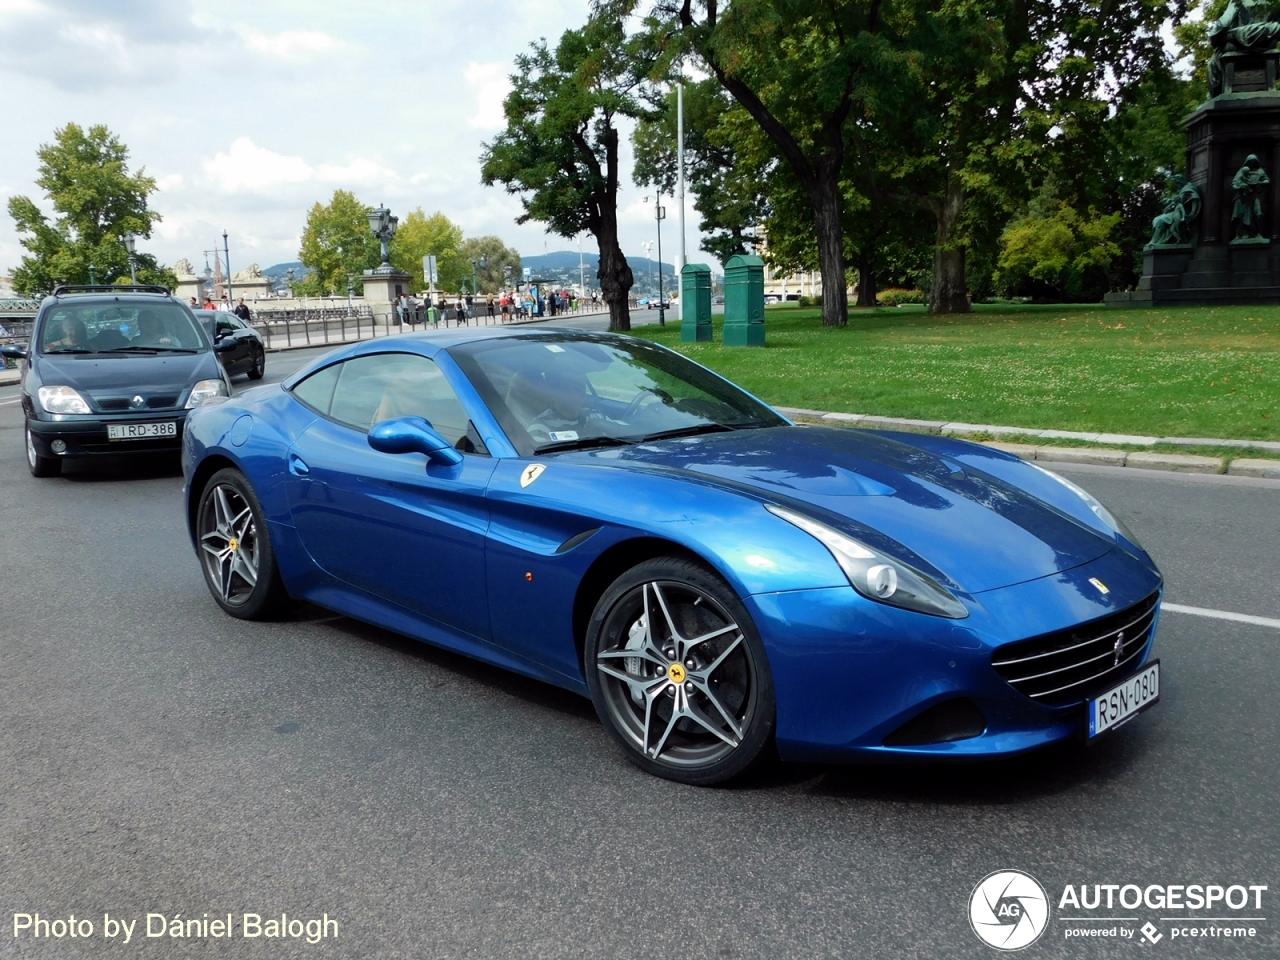 Ferrari California T - 4 November 2019 - Autogespot